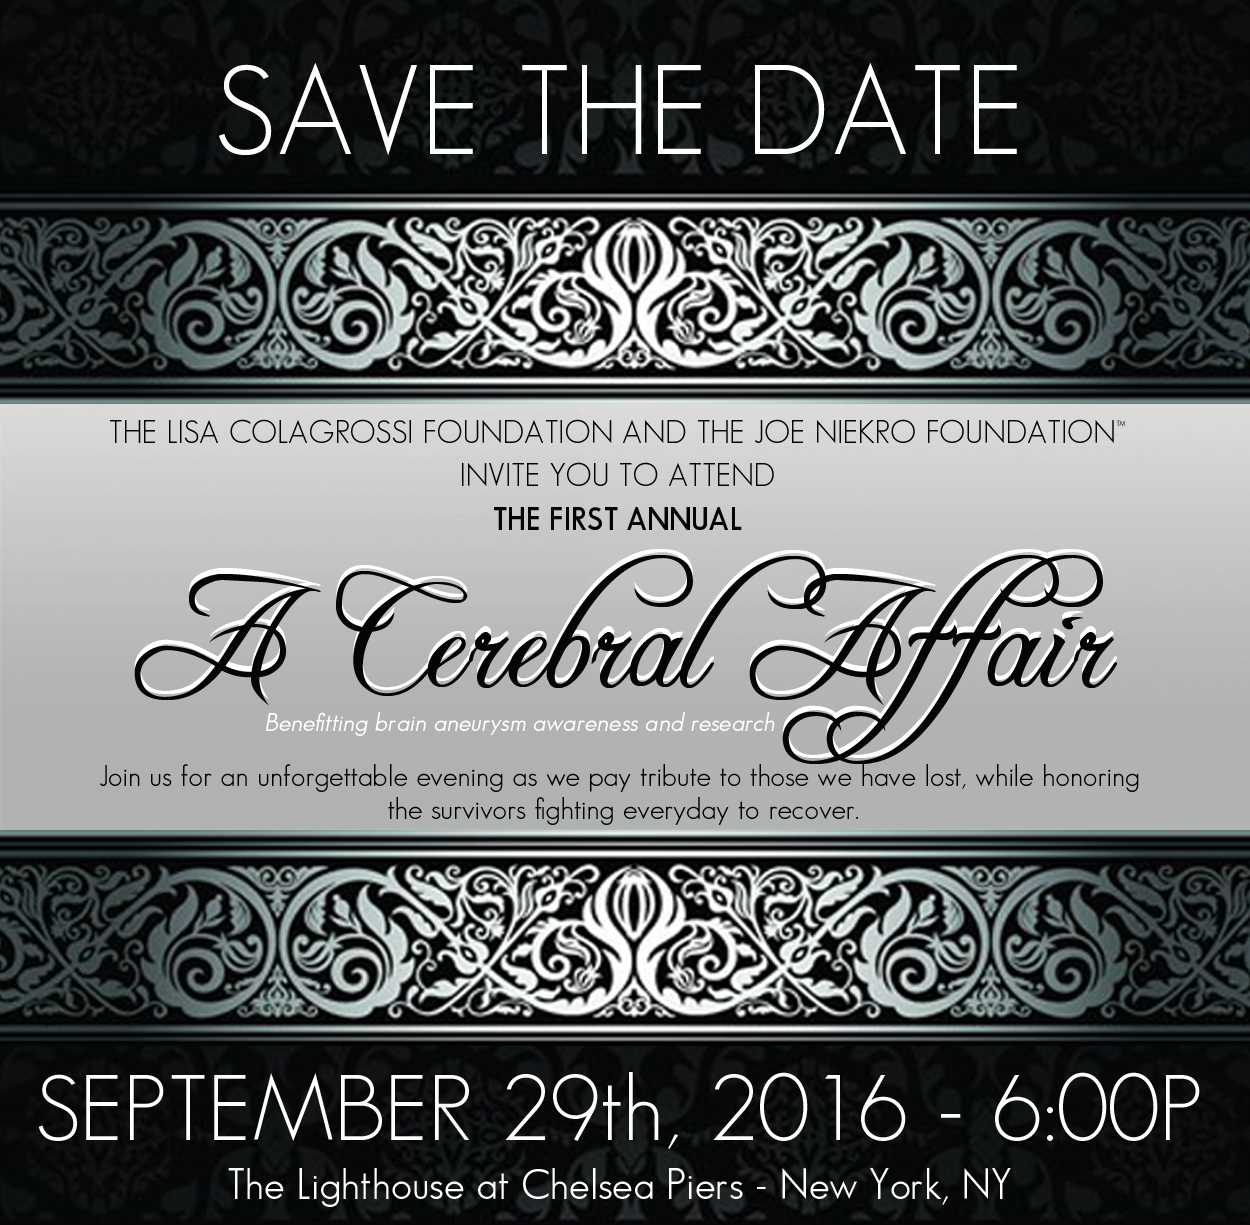 http://www.joeniekrofoundation.com/events/past-events/pastevents2016/a-cerebral-affair/attachment/black-and-silver4/